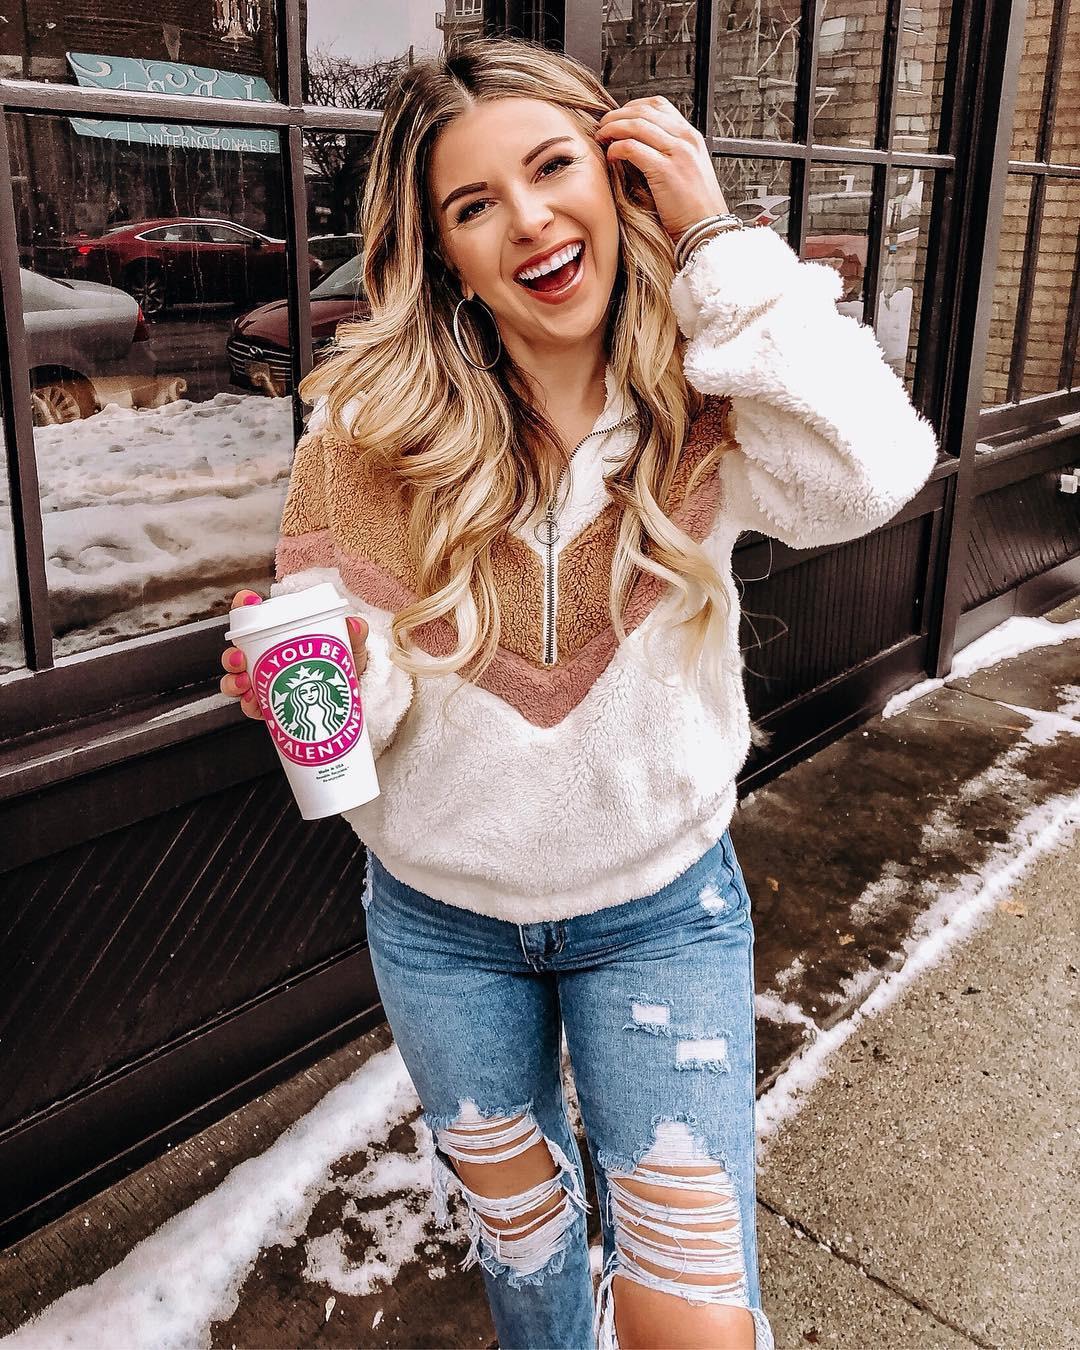 Hb6d9f05b132545fbbb2dc36cc787f1dfz New Style Women Warm Teddy Bear Fleece Pullover Coat Zip Outwear Overcoat Long Sleeve Jumper Top Pullover Winter Warm Soft Coat